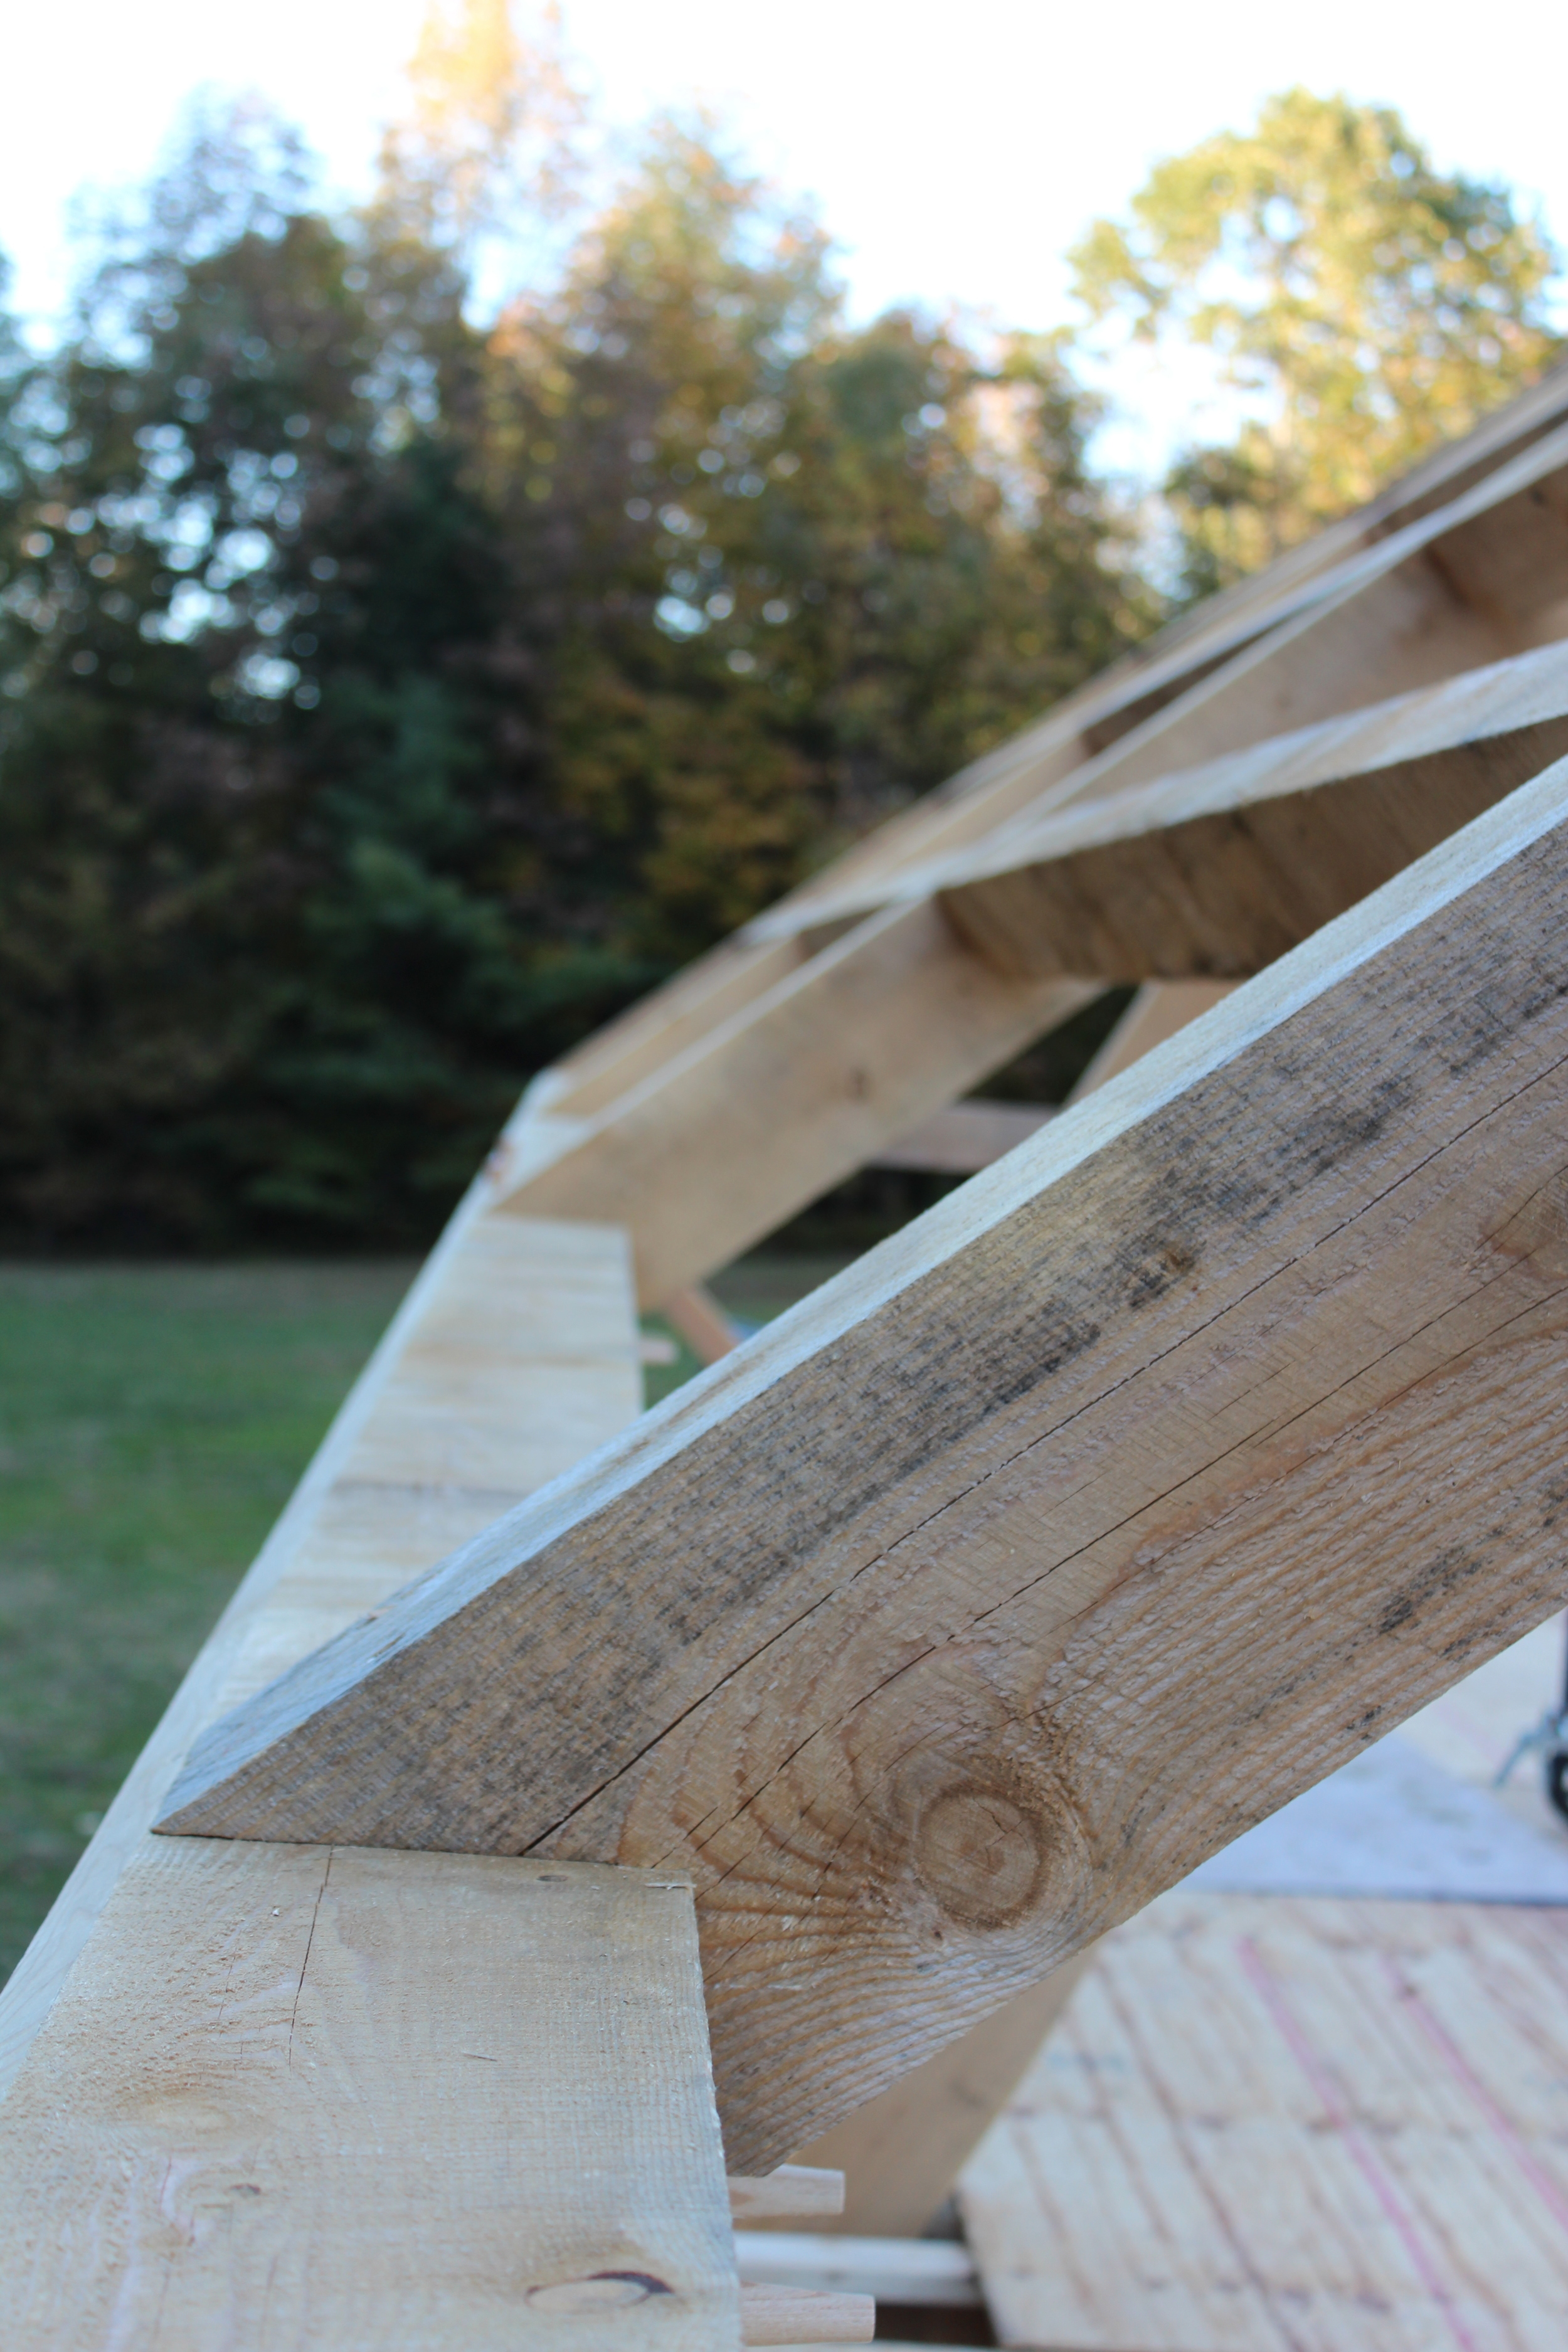 Timberframe roof detail, Ashfield MA